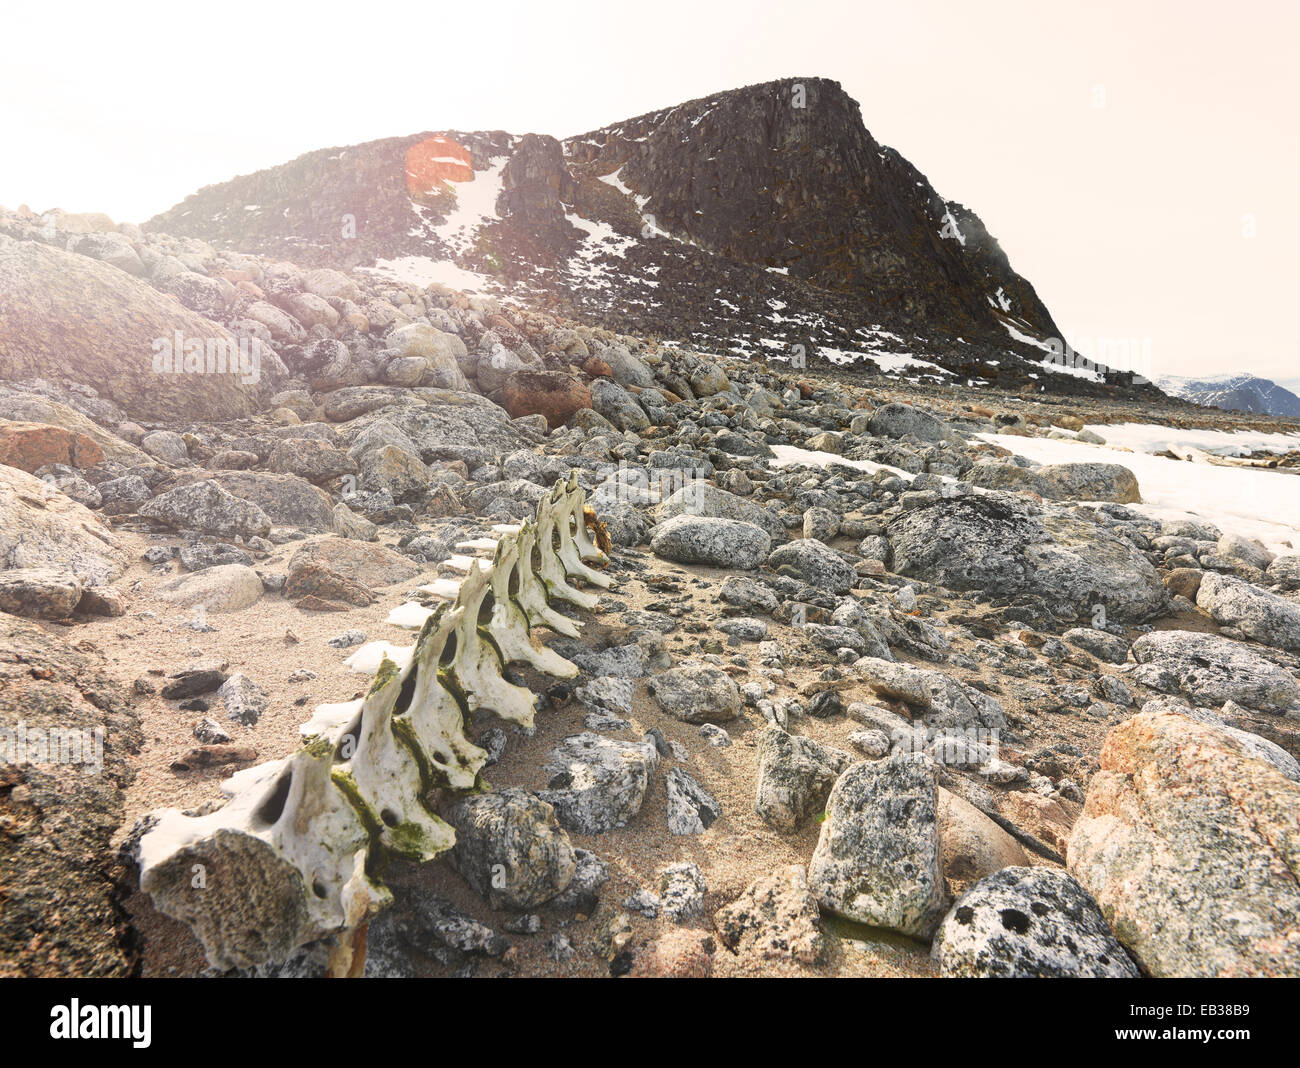 Whale bones on a rocky coast, Spitsbergen Island, Svalbard Archipelago, Svalbard and Jan Mayen, Norway - Stock Image